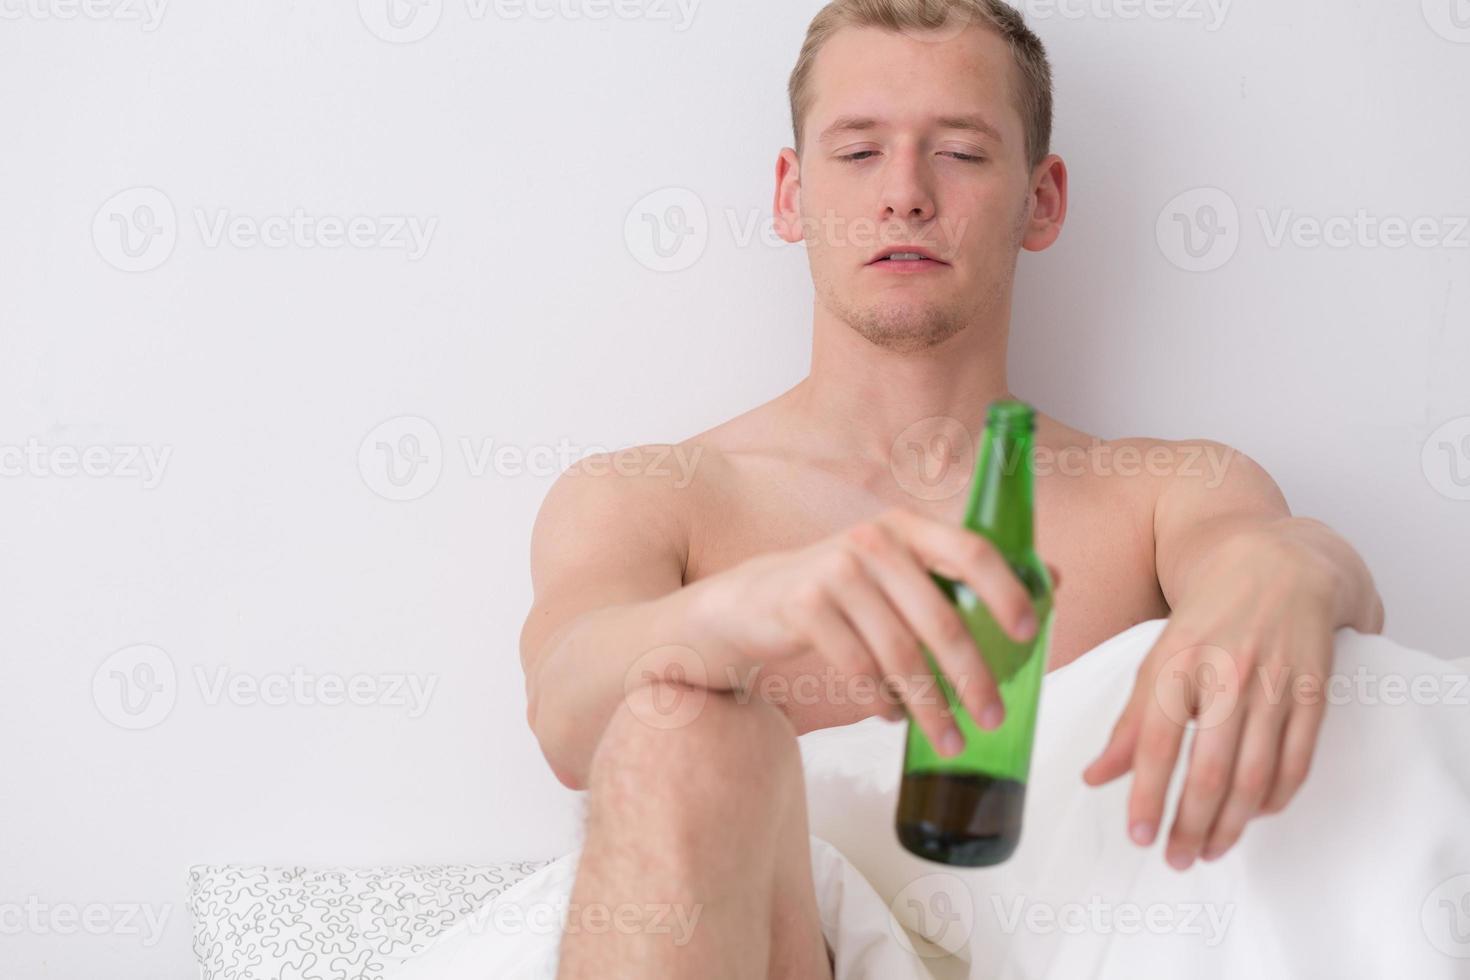 morgens Bier trinken foto